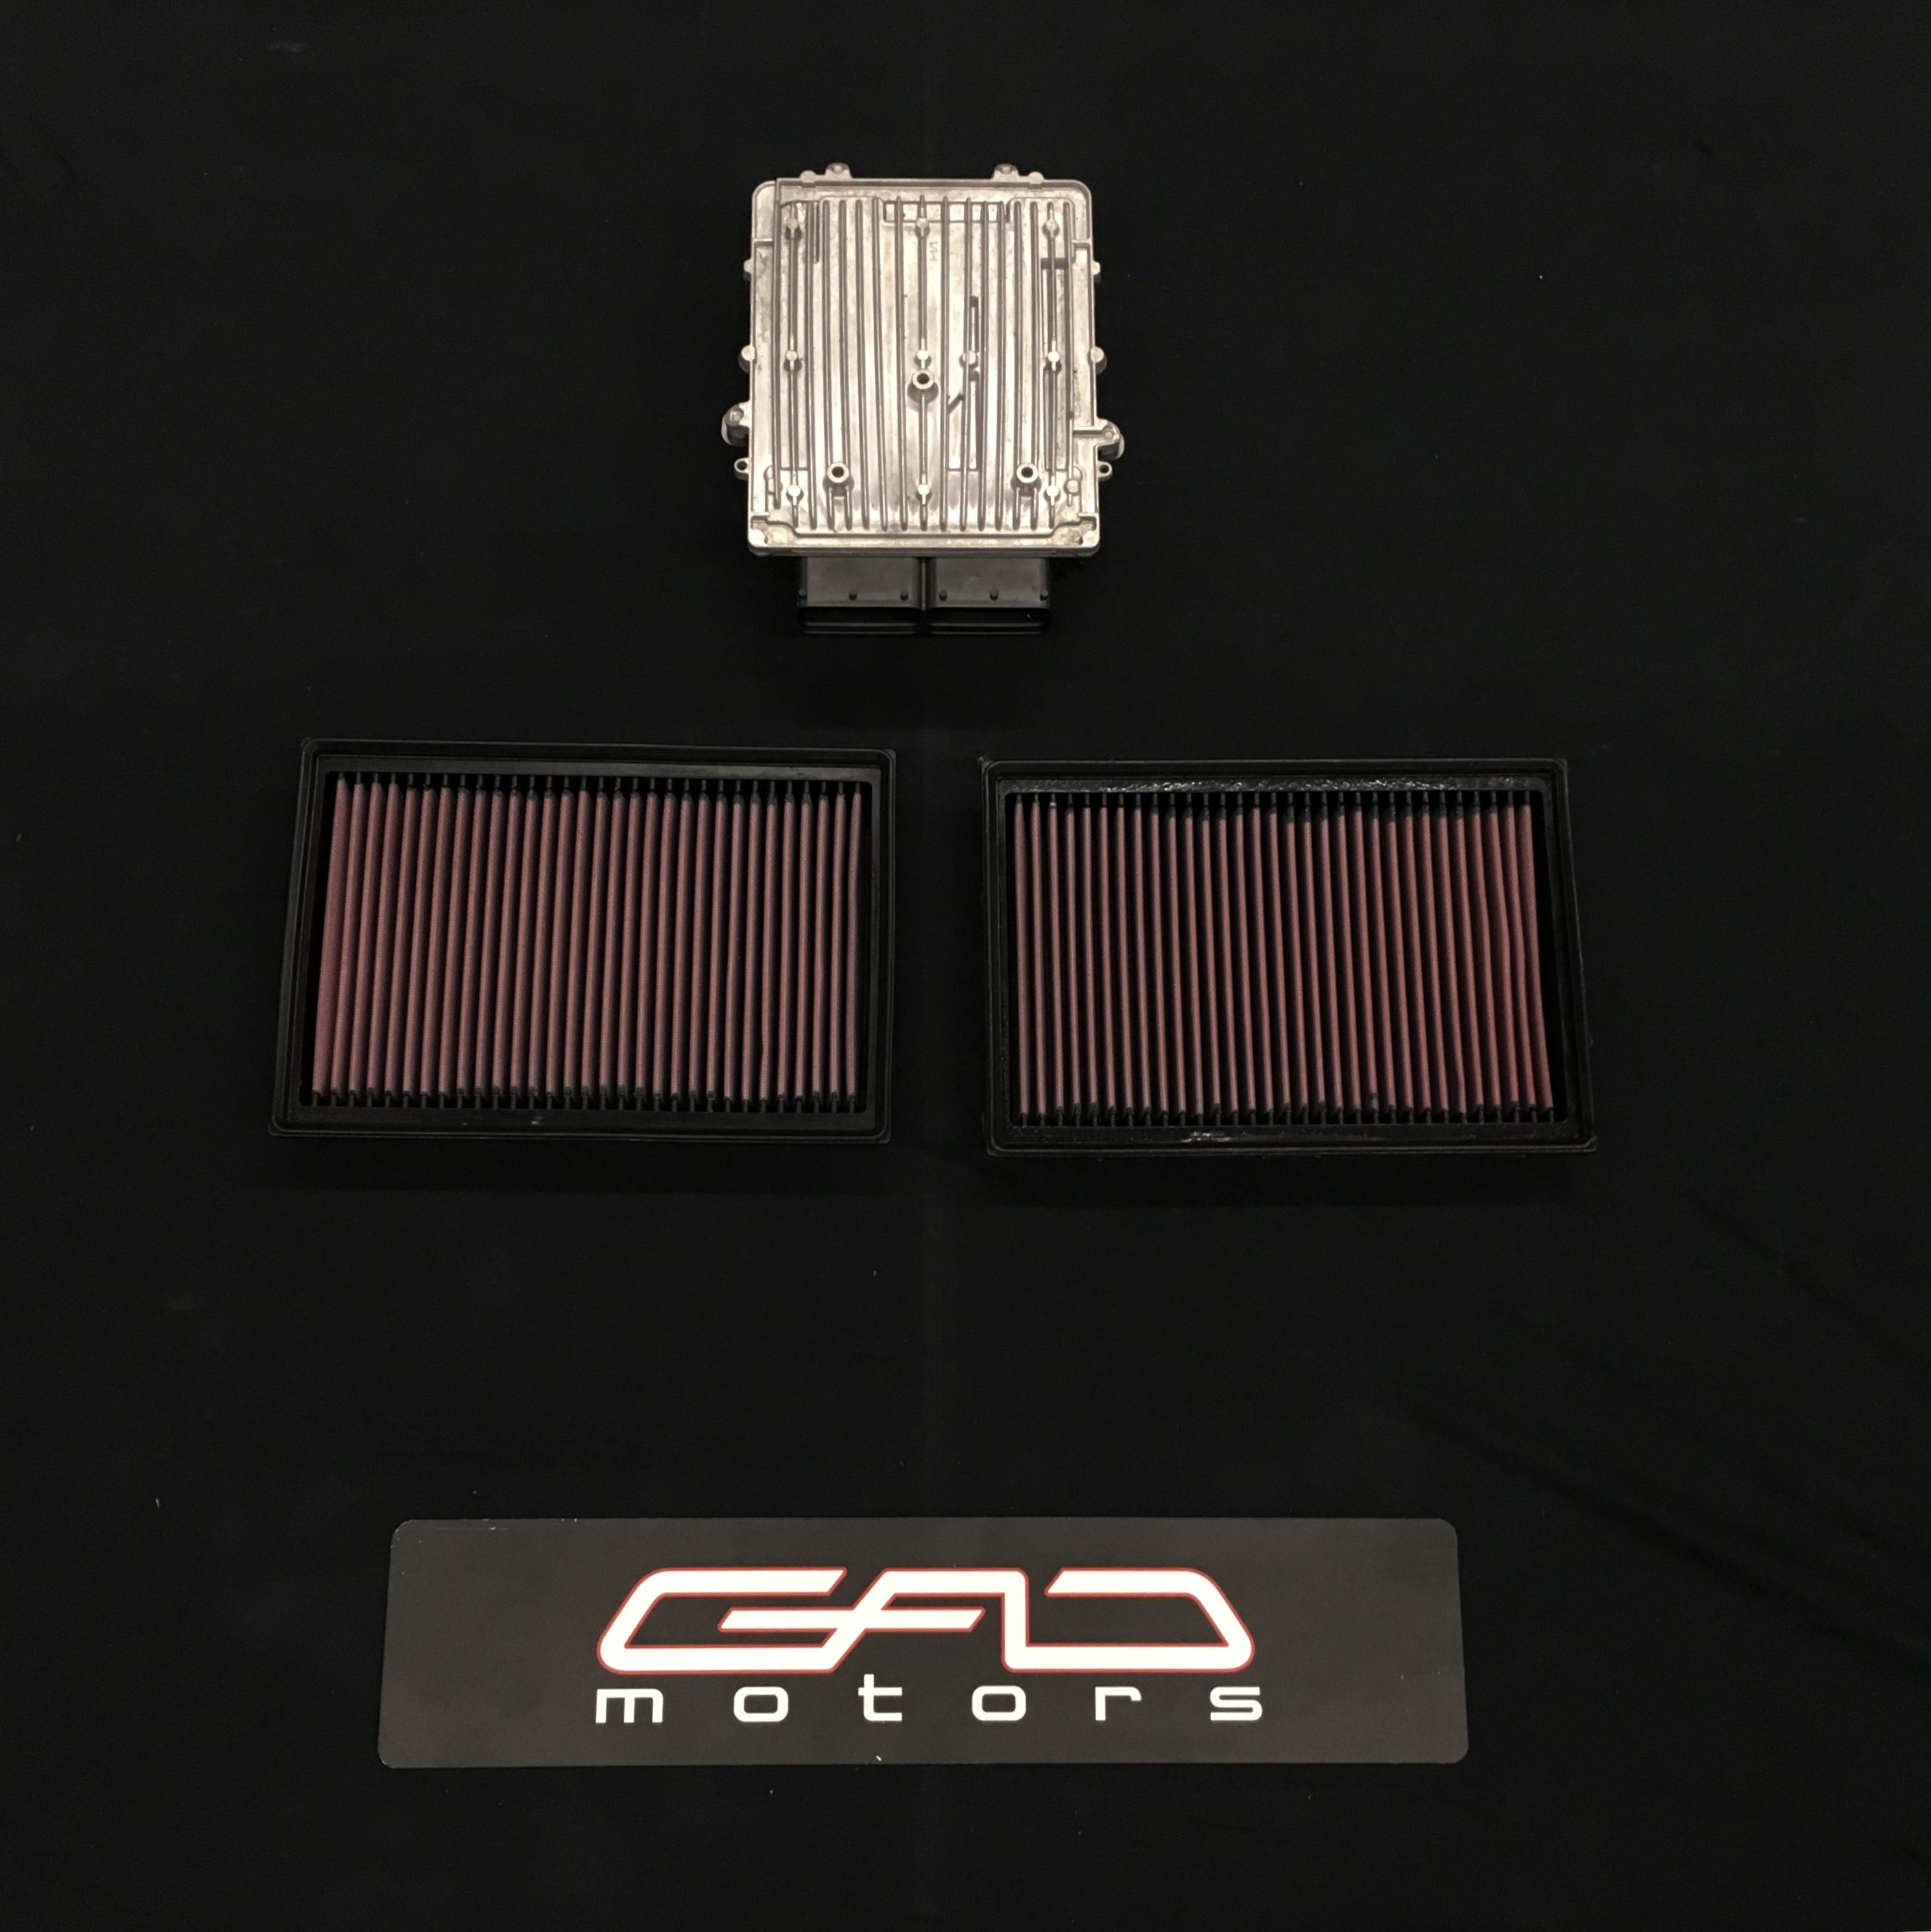 Stage1 GAD-Motors